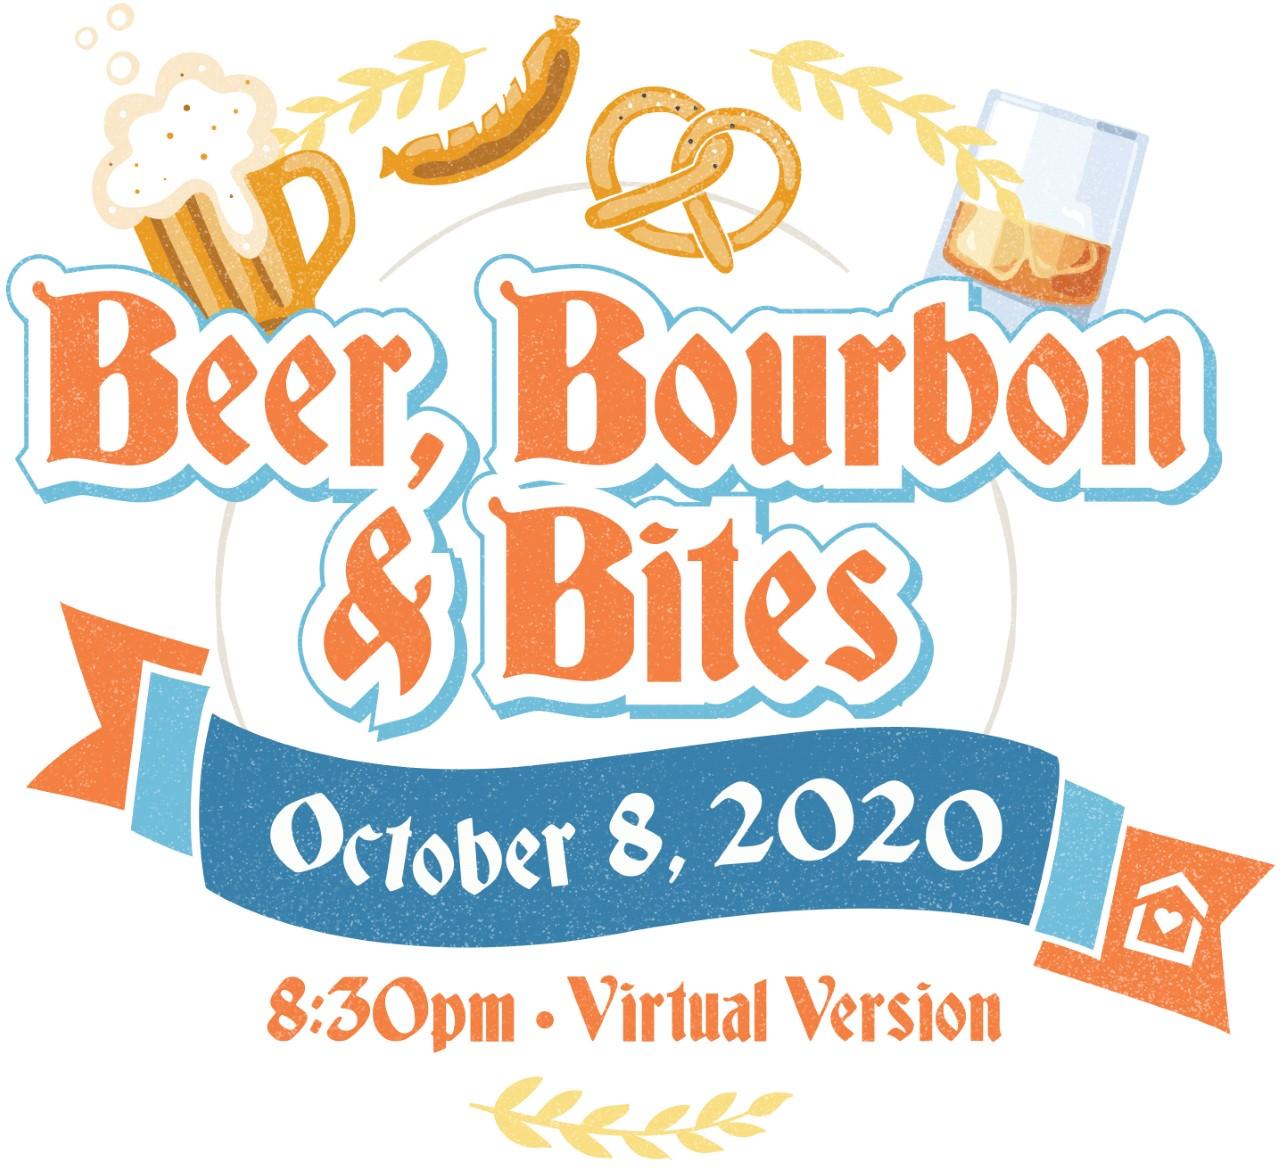 Beer, Bourbon, & Bites Virtual Version image